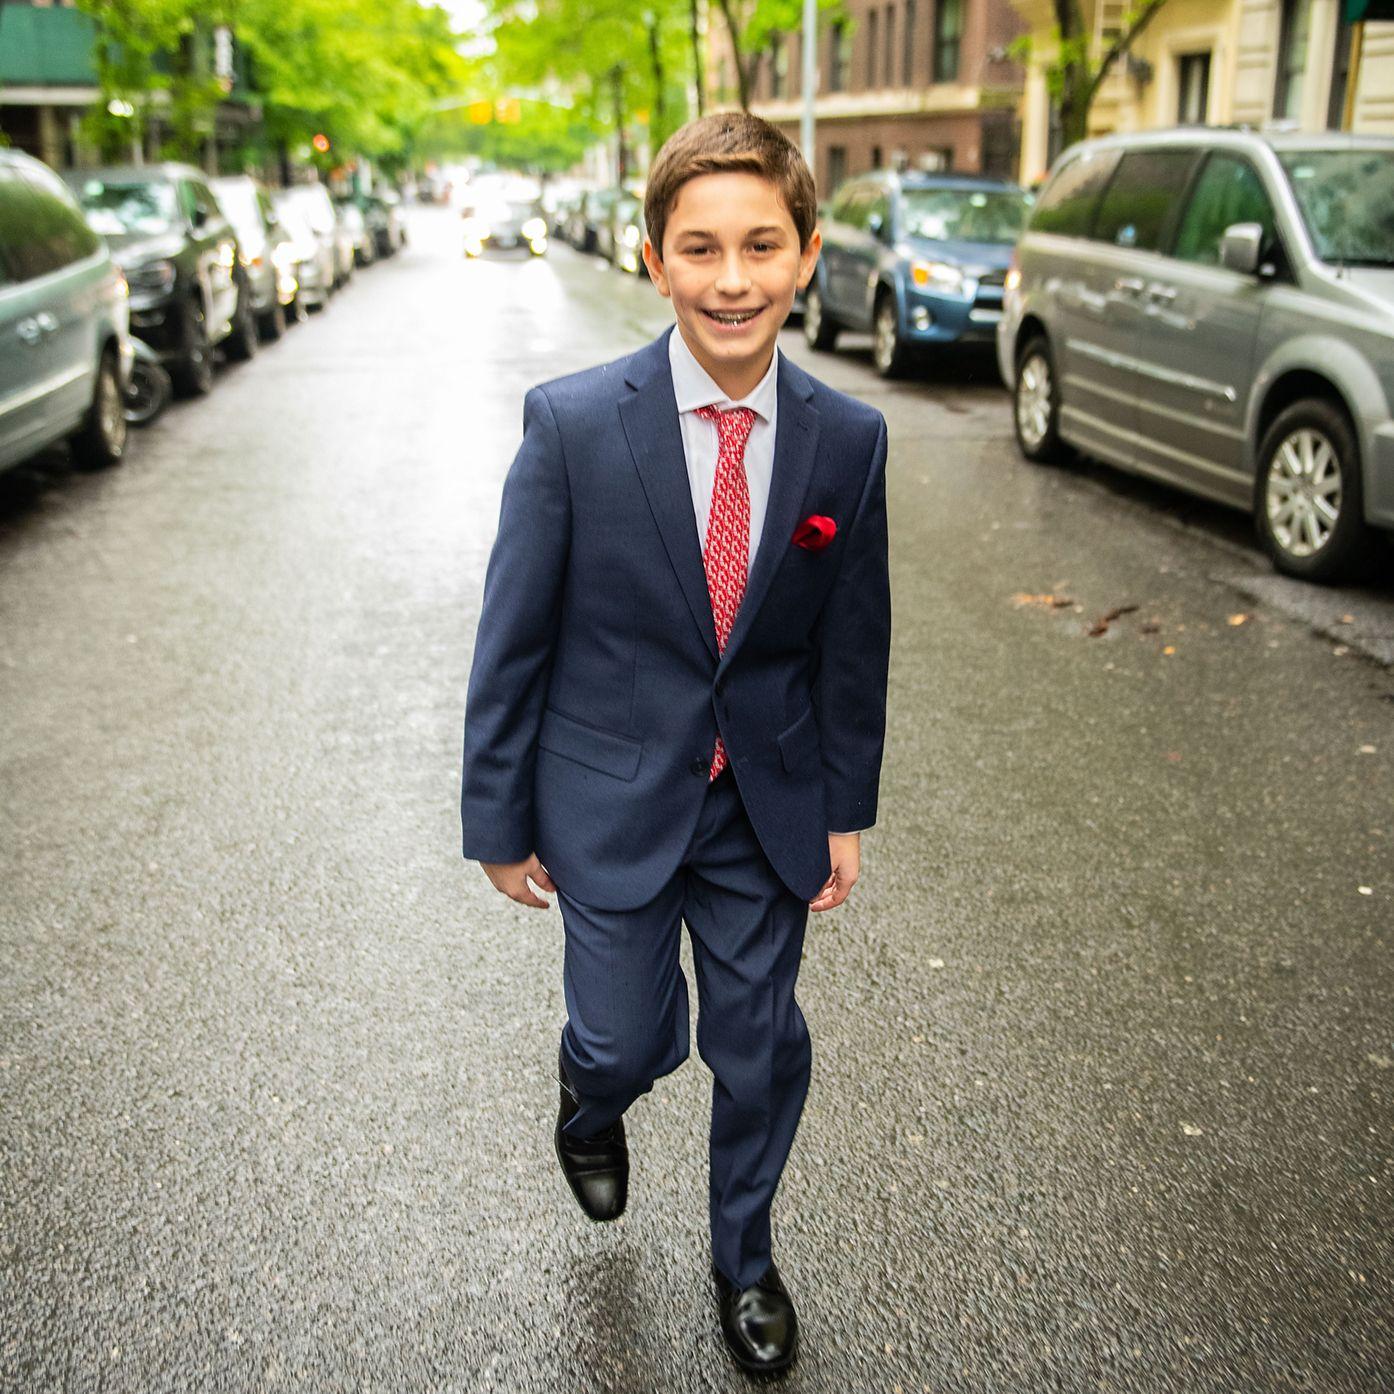 A New York Bar Mitzvah Photo Shoot